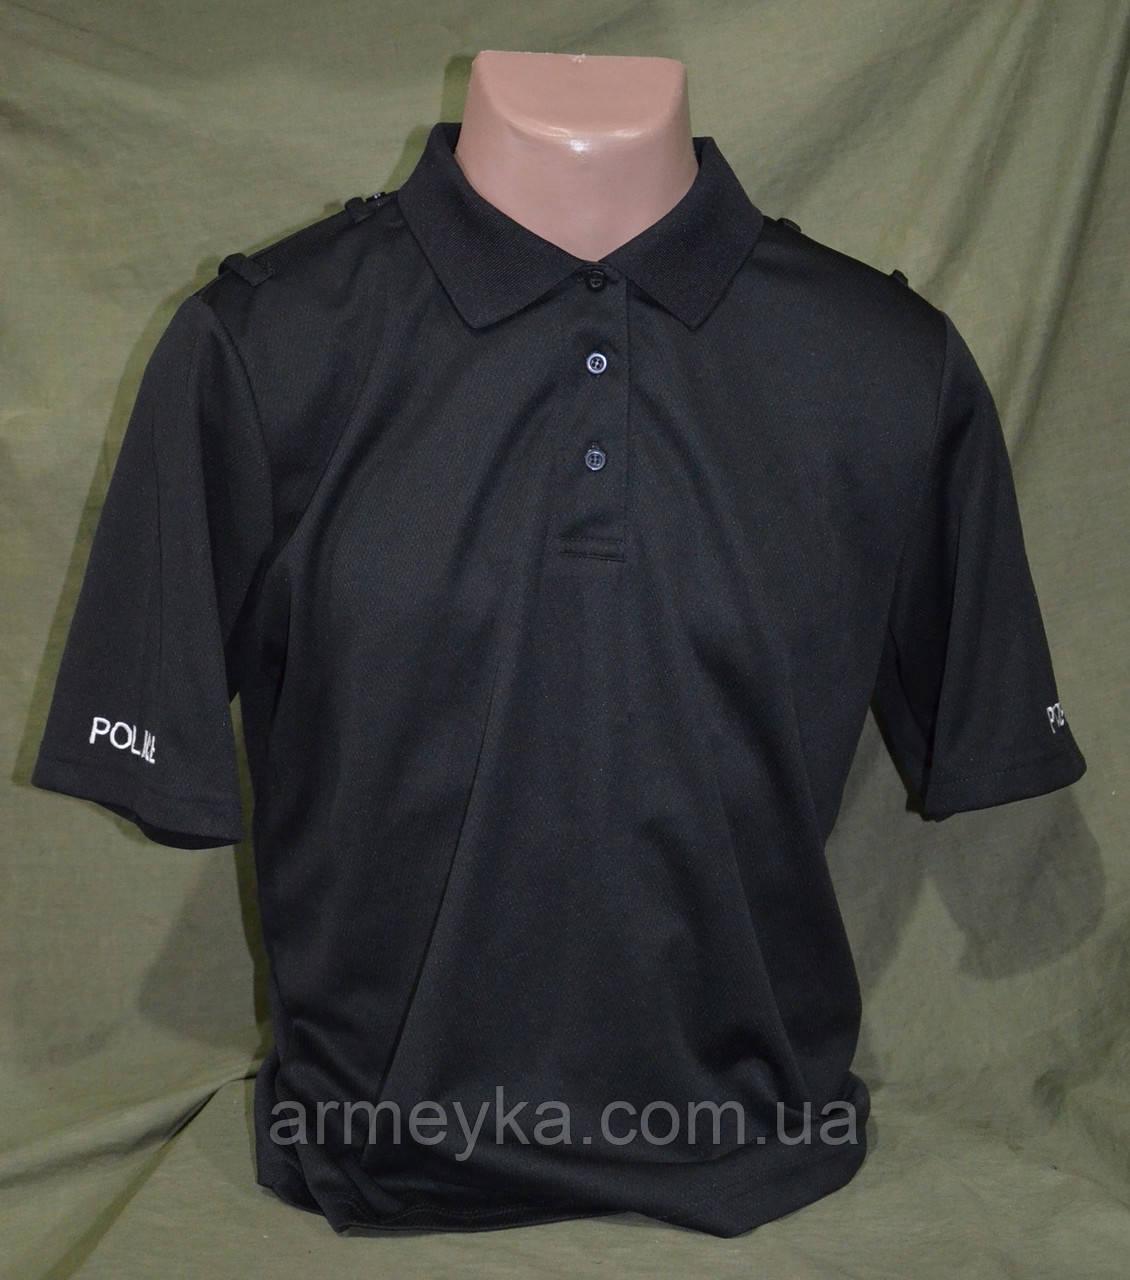 CoolMax футболка-поло полиции Великобритании ,  черная  оригинал